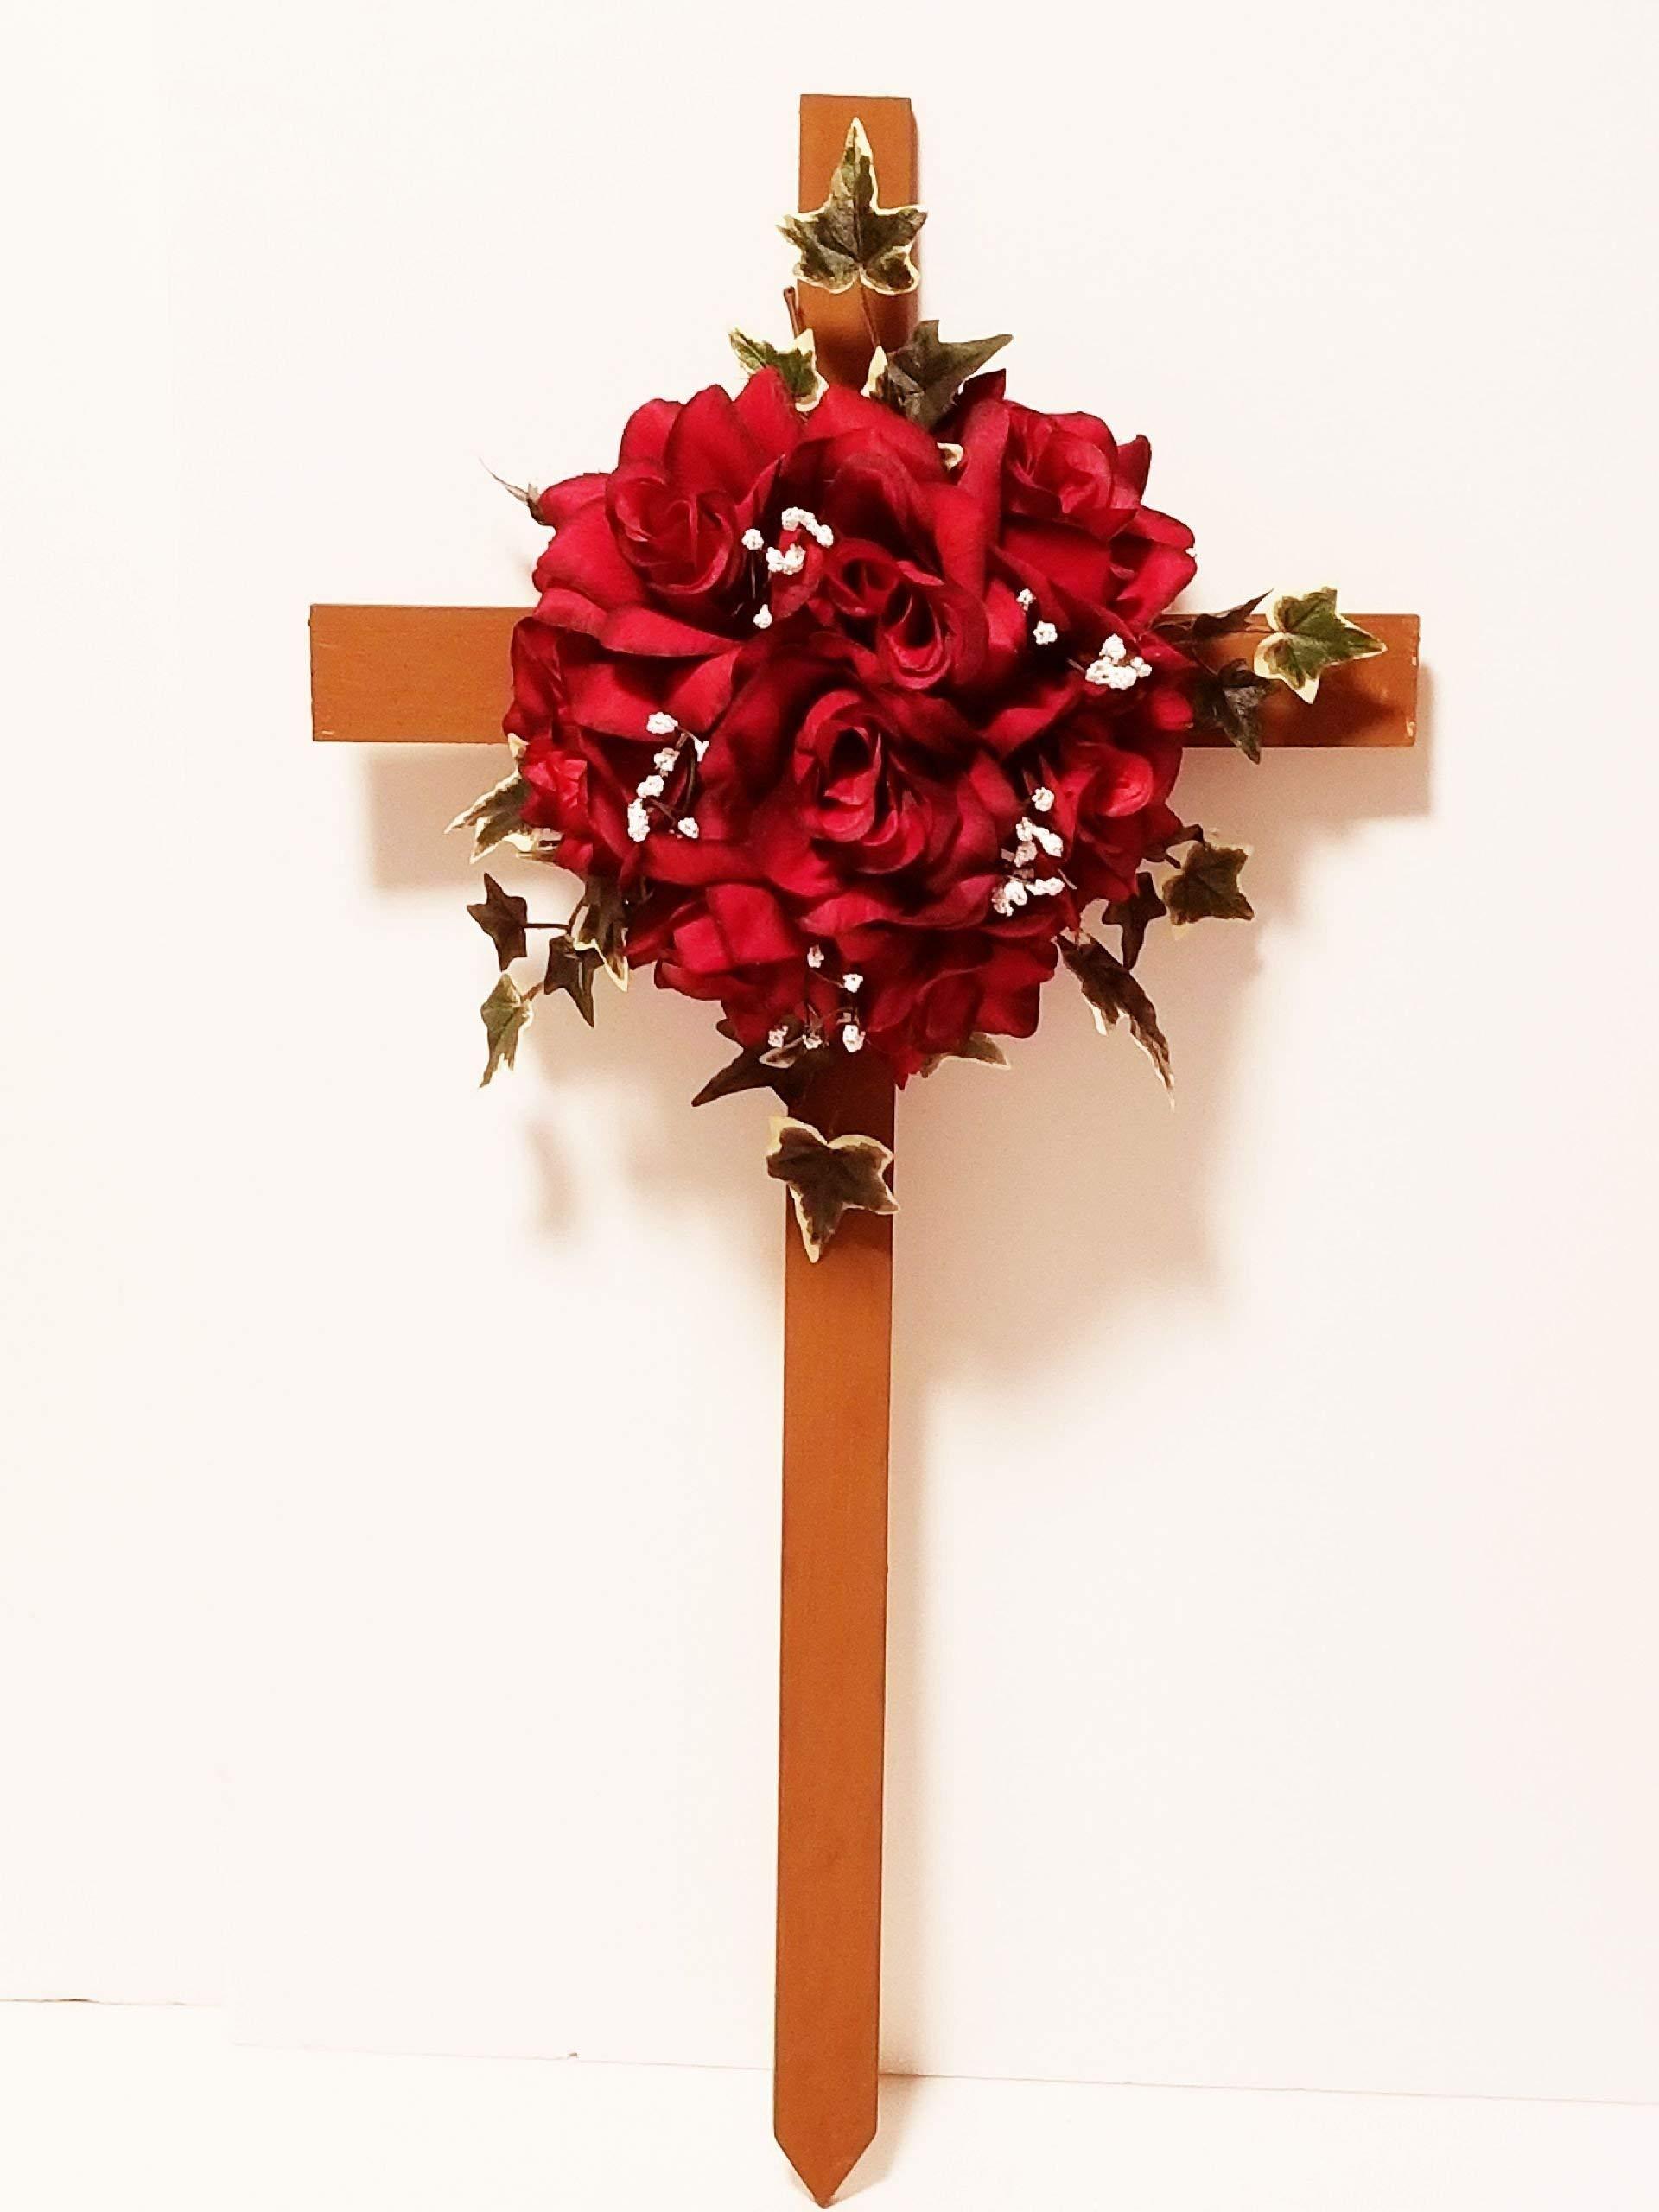 Cemetery-Silk-Flowers-Memorial-Cross-Red-Roses